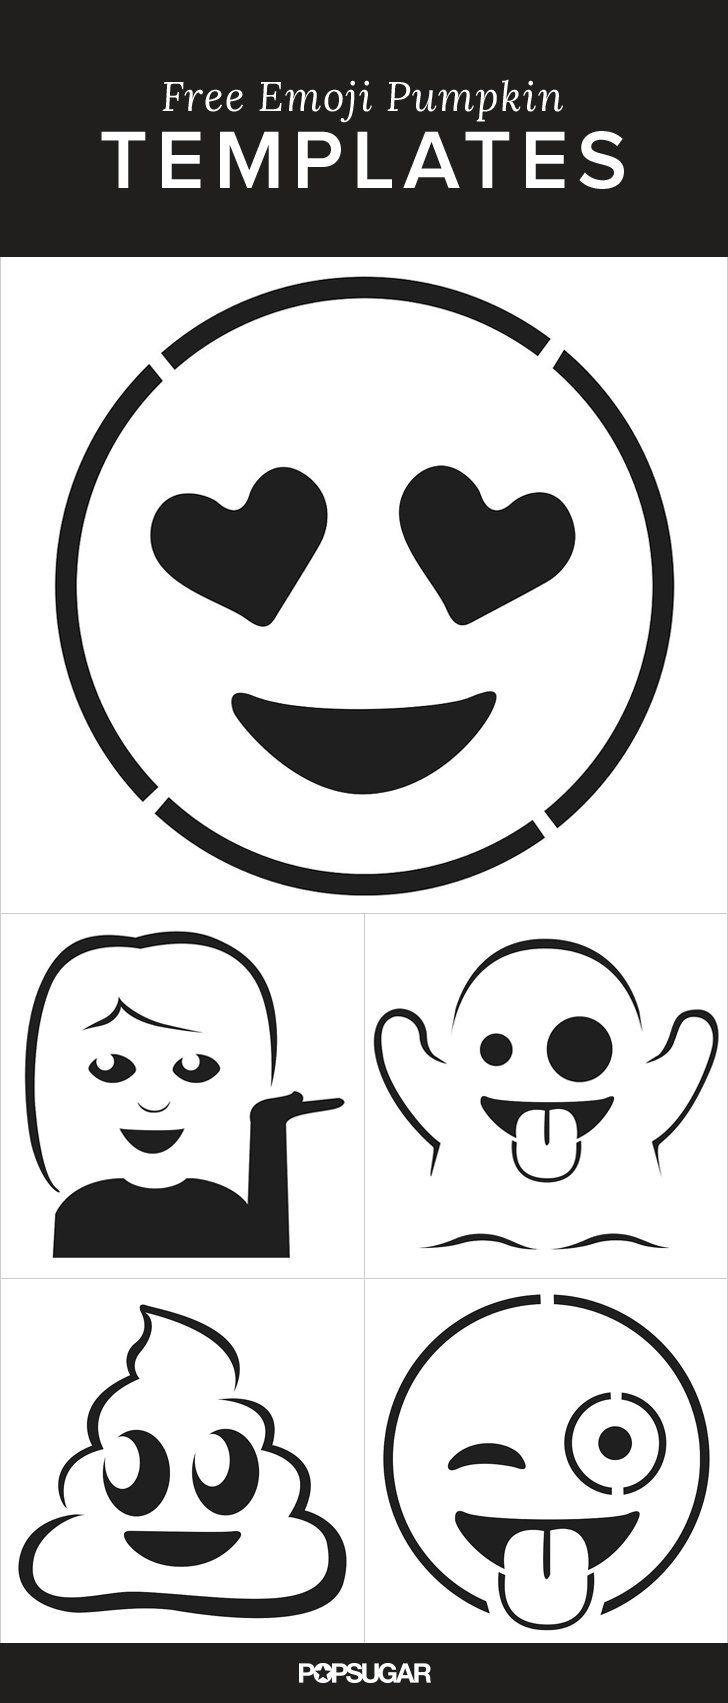 Here are the emoji pumpkin templates of your dreams pumpkin template emoji and holidays for Pumpkin stencils emoji